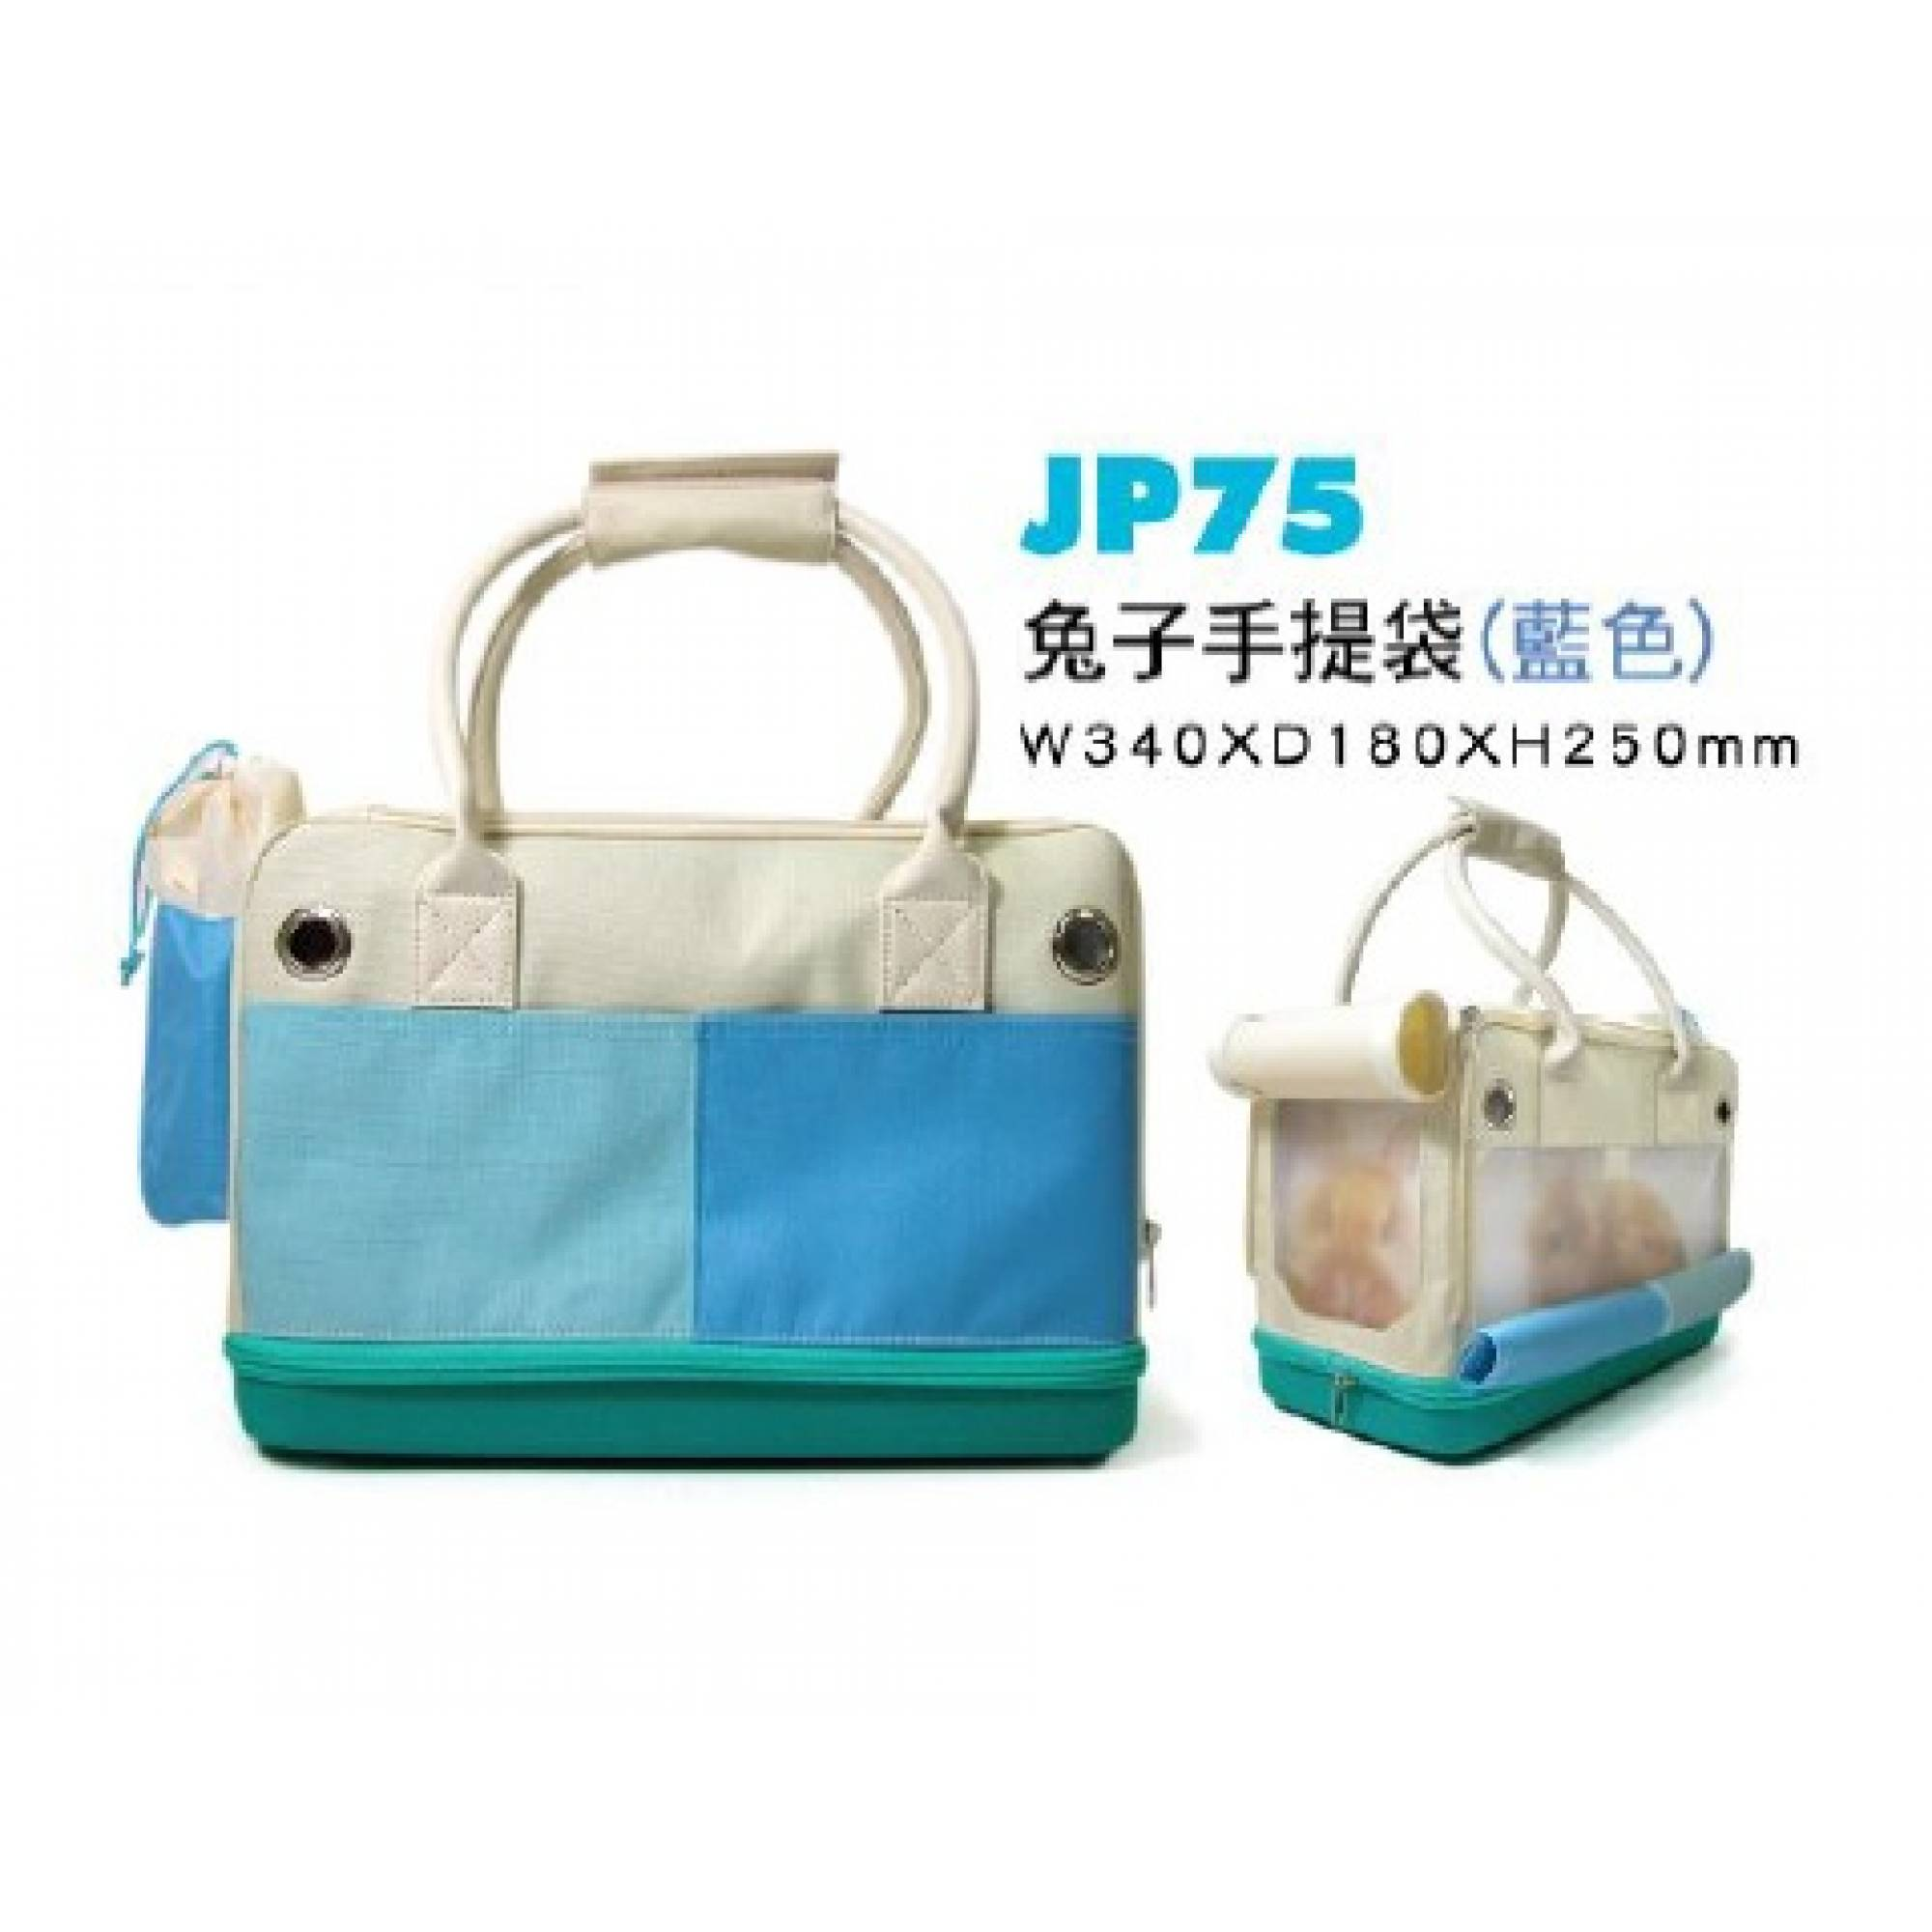 JOLLY Rabbit Carry Bag - Blue